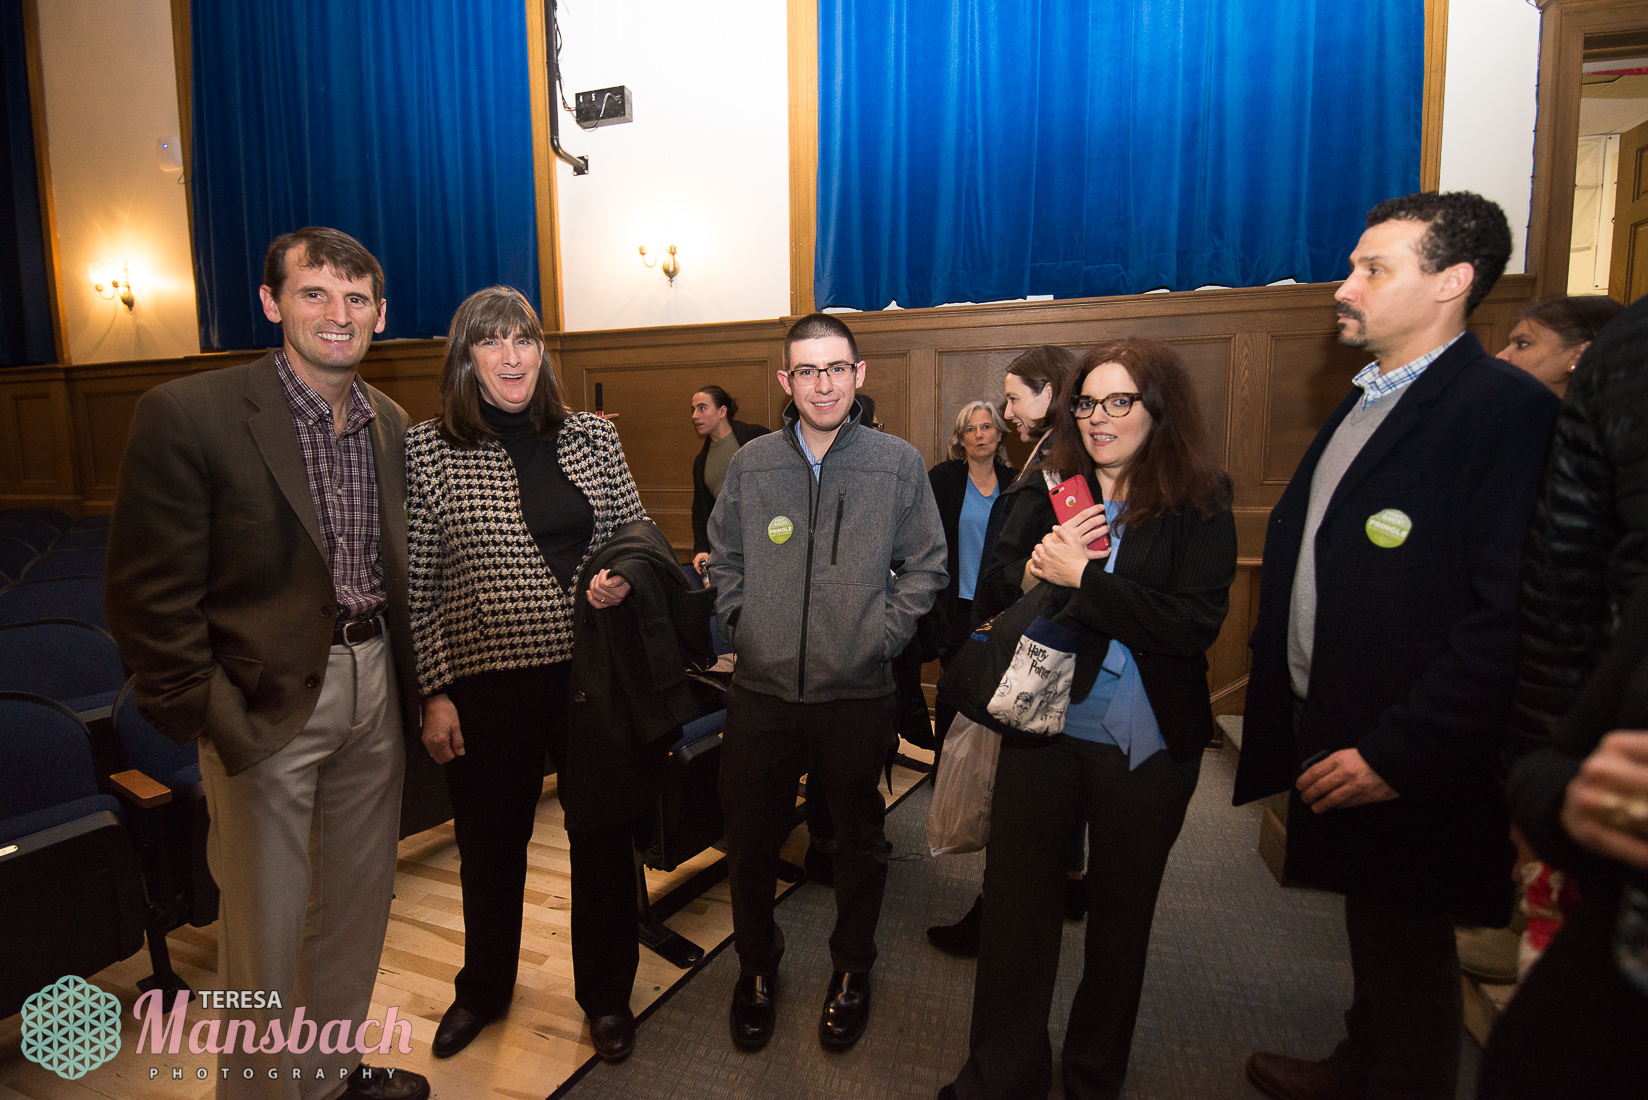 SpringfieldNJ-Democratic-Canidates-Congress-0034.jpg